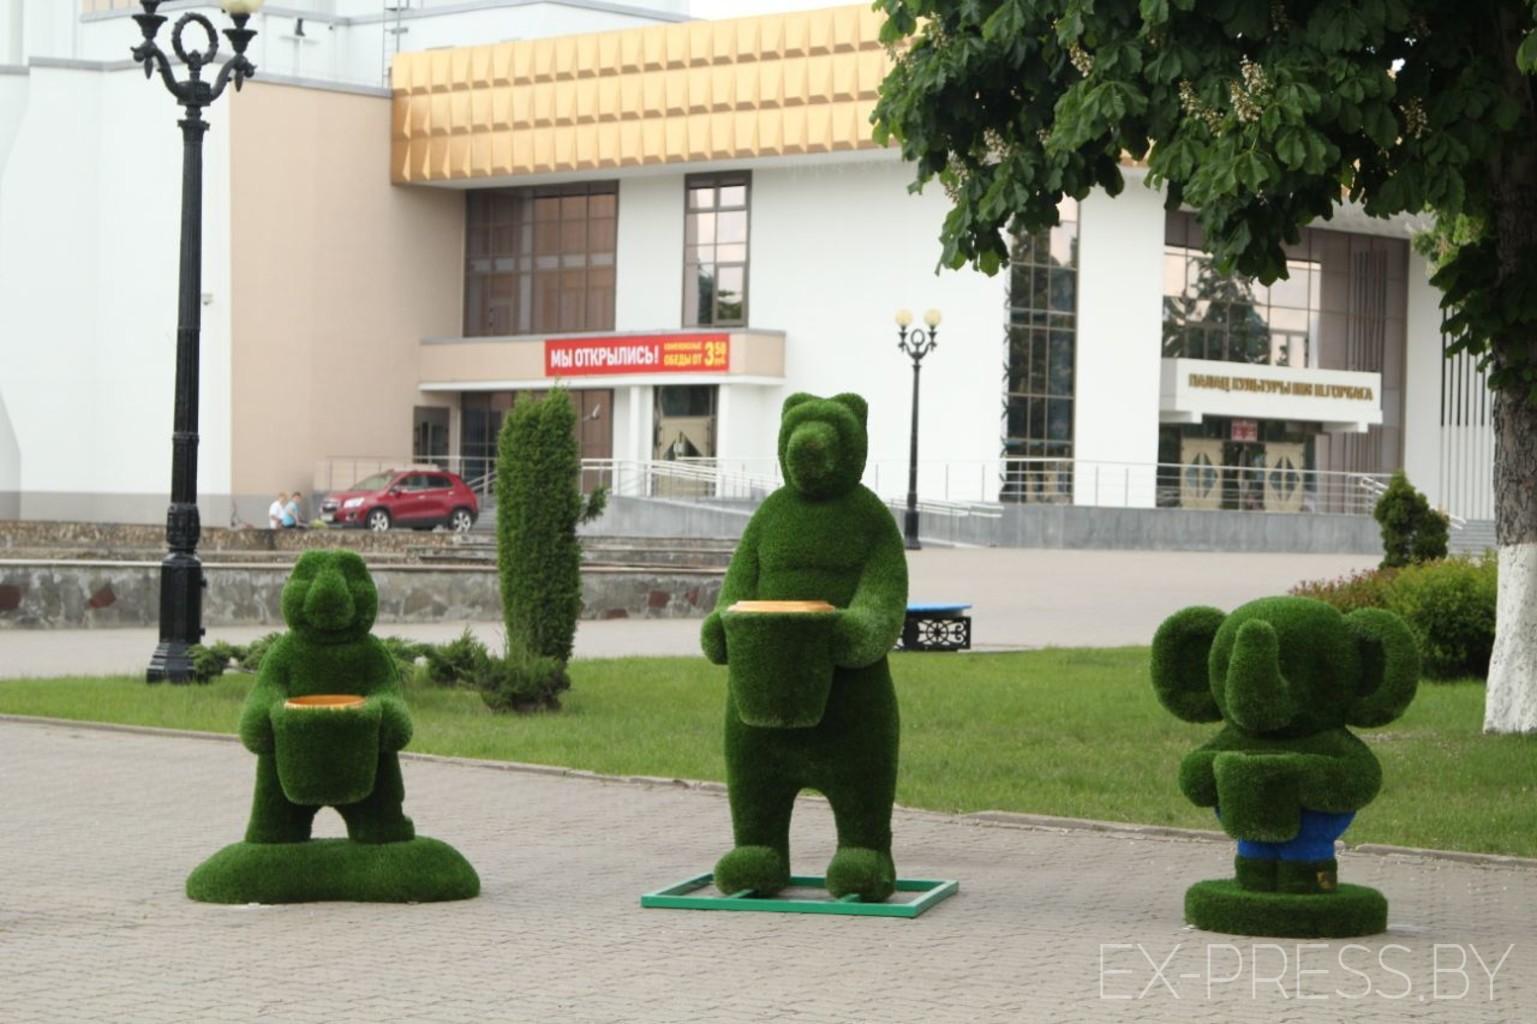 Зеленая черепаха, медведь и слон: у Дворца культуры Борисова появились  скульптуры | EX-PRESS.BY